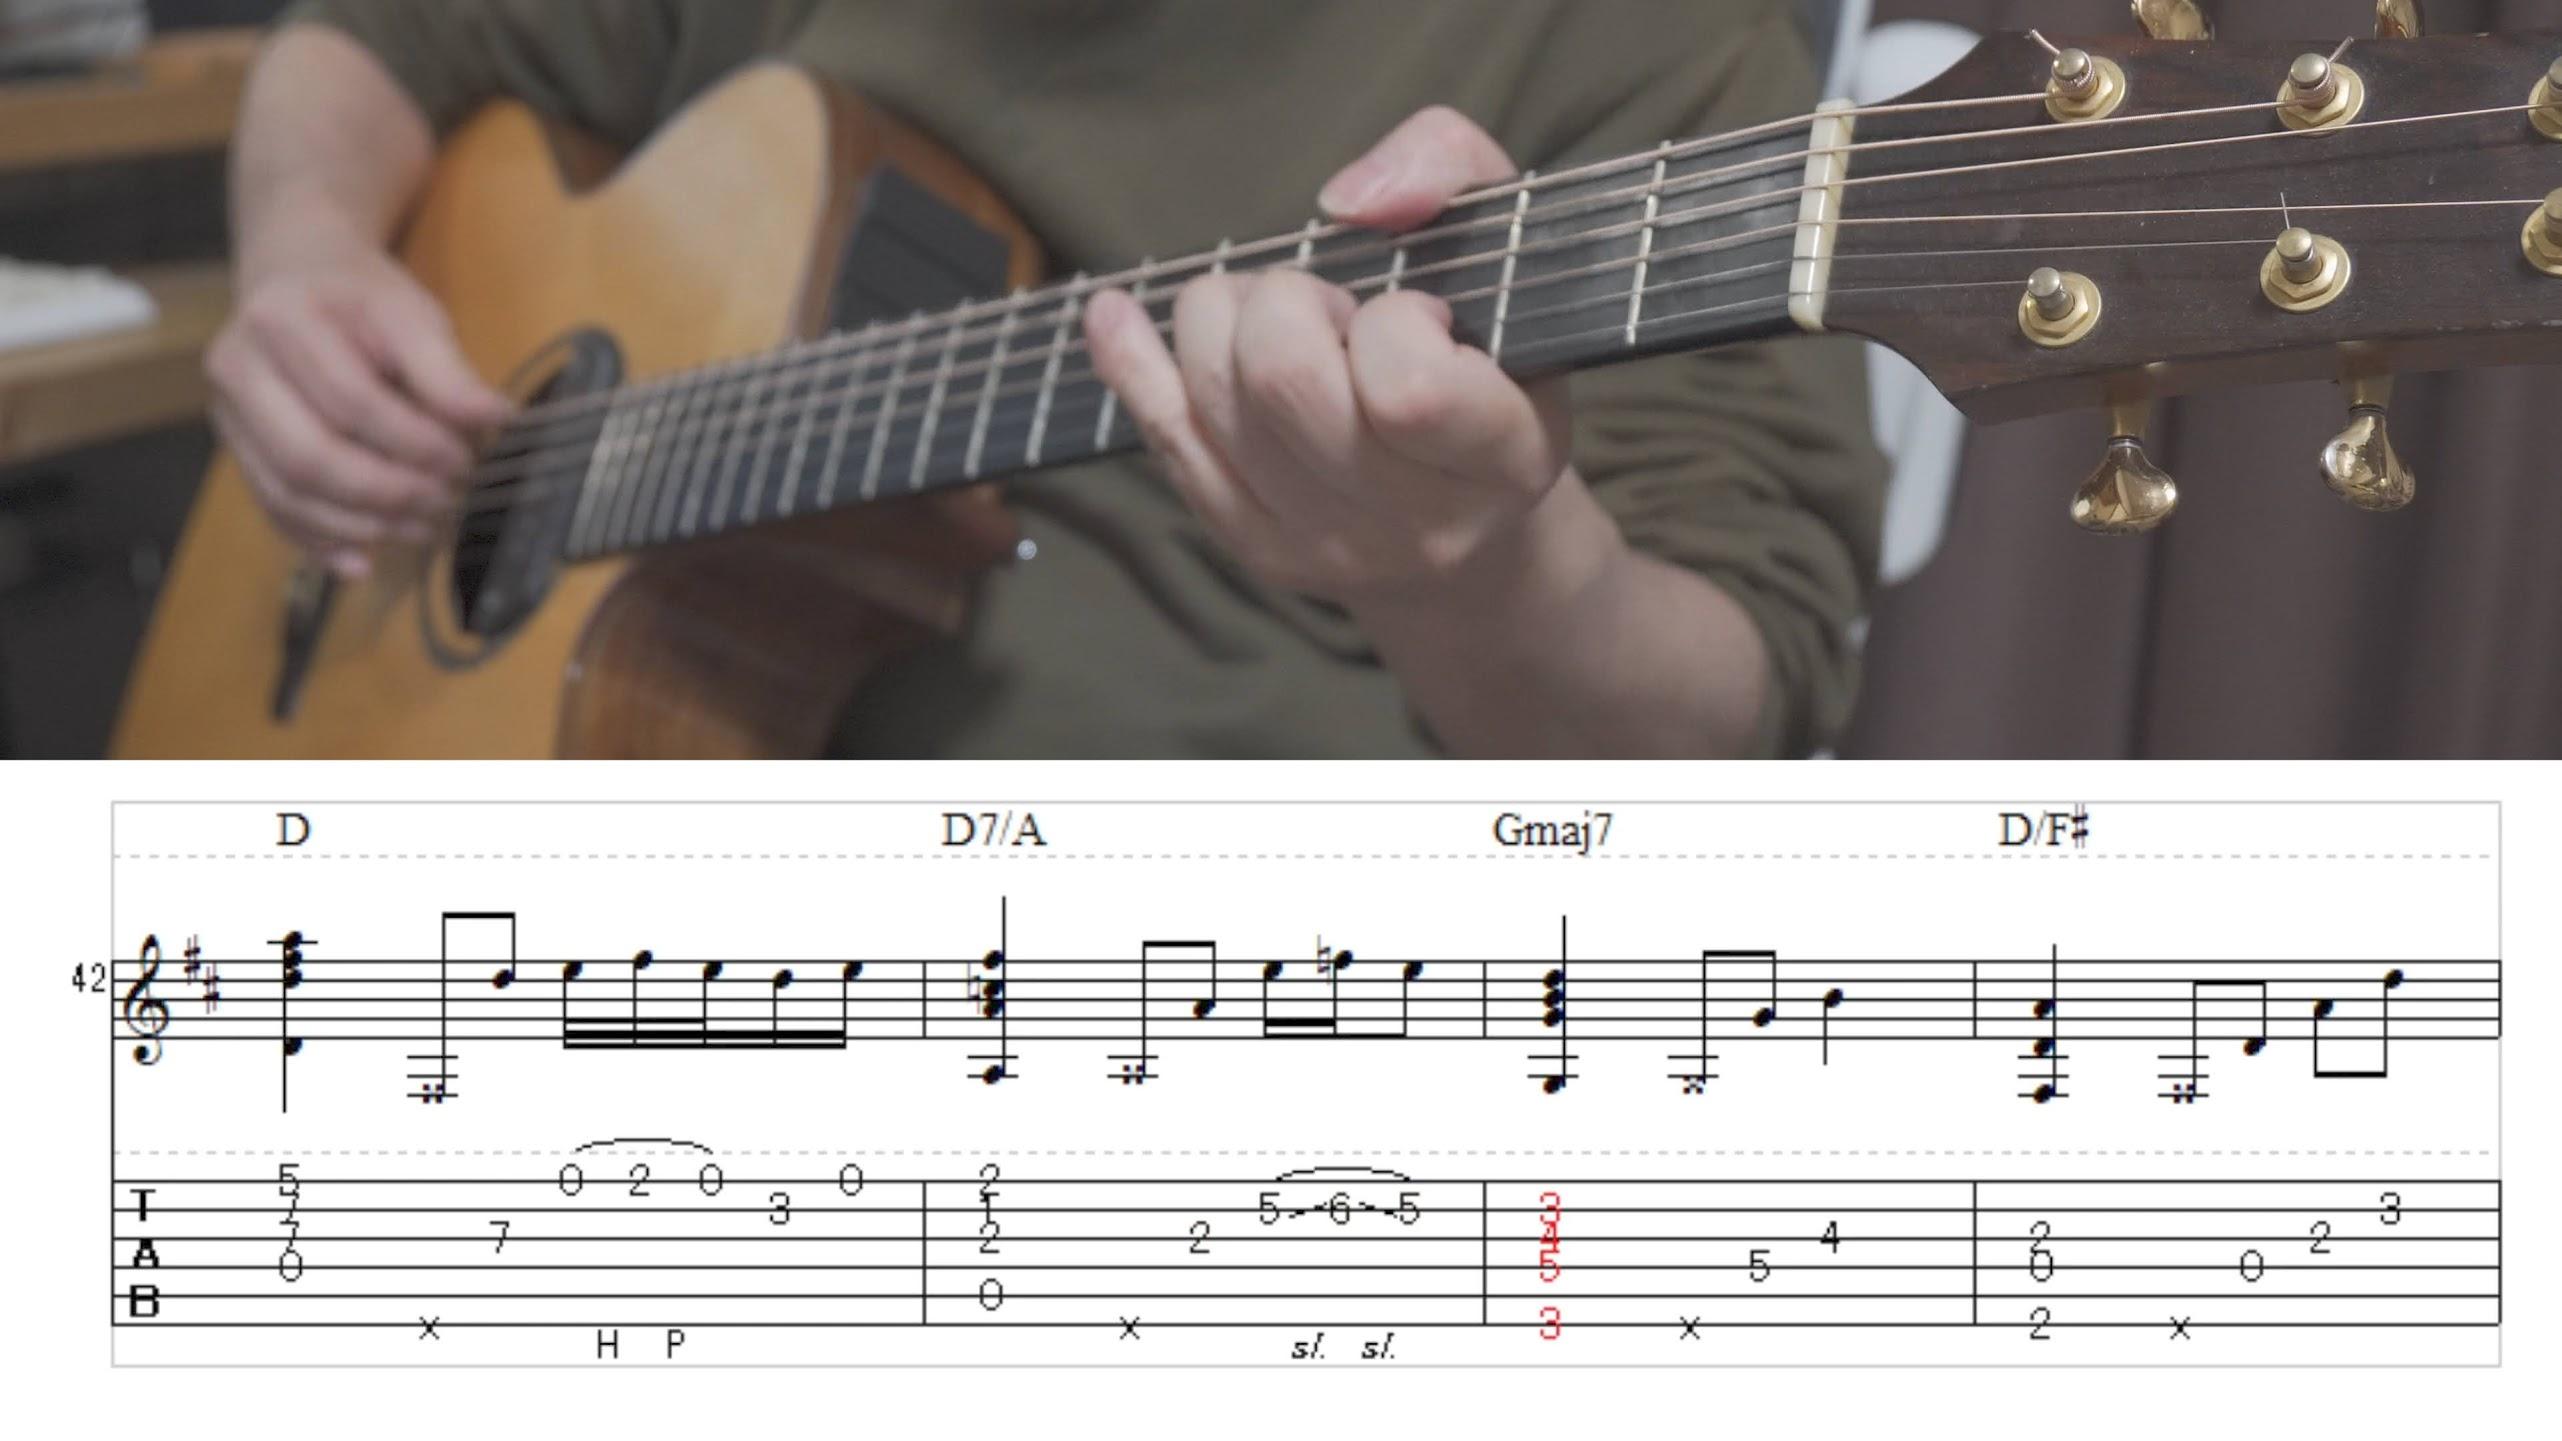 【Solo guitar】Amazing Grace アメイジング・グレイス【Tablature】【TAB譜】【ソロギター】(動画)